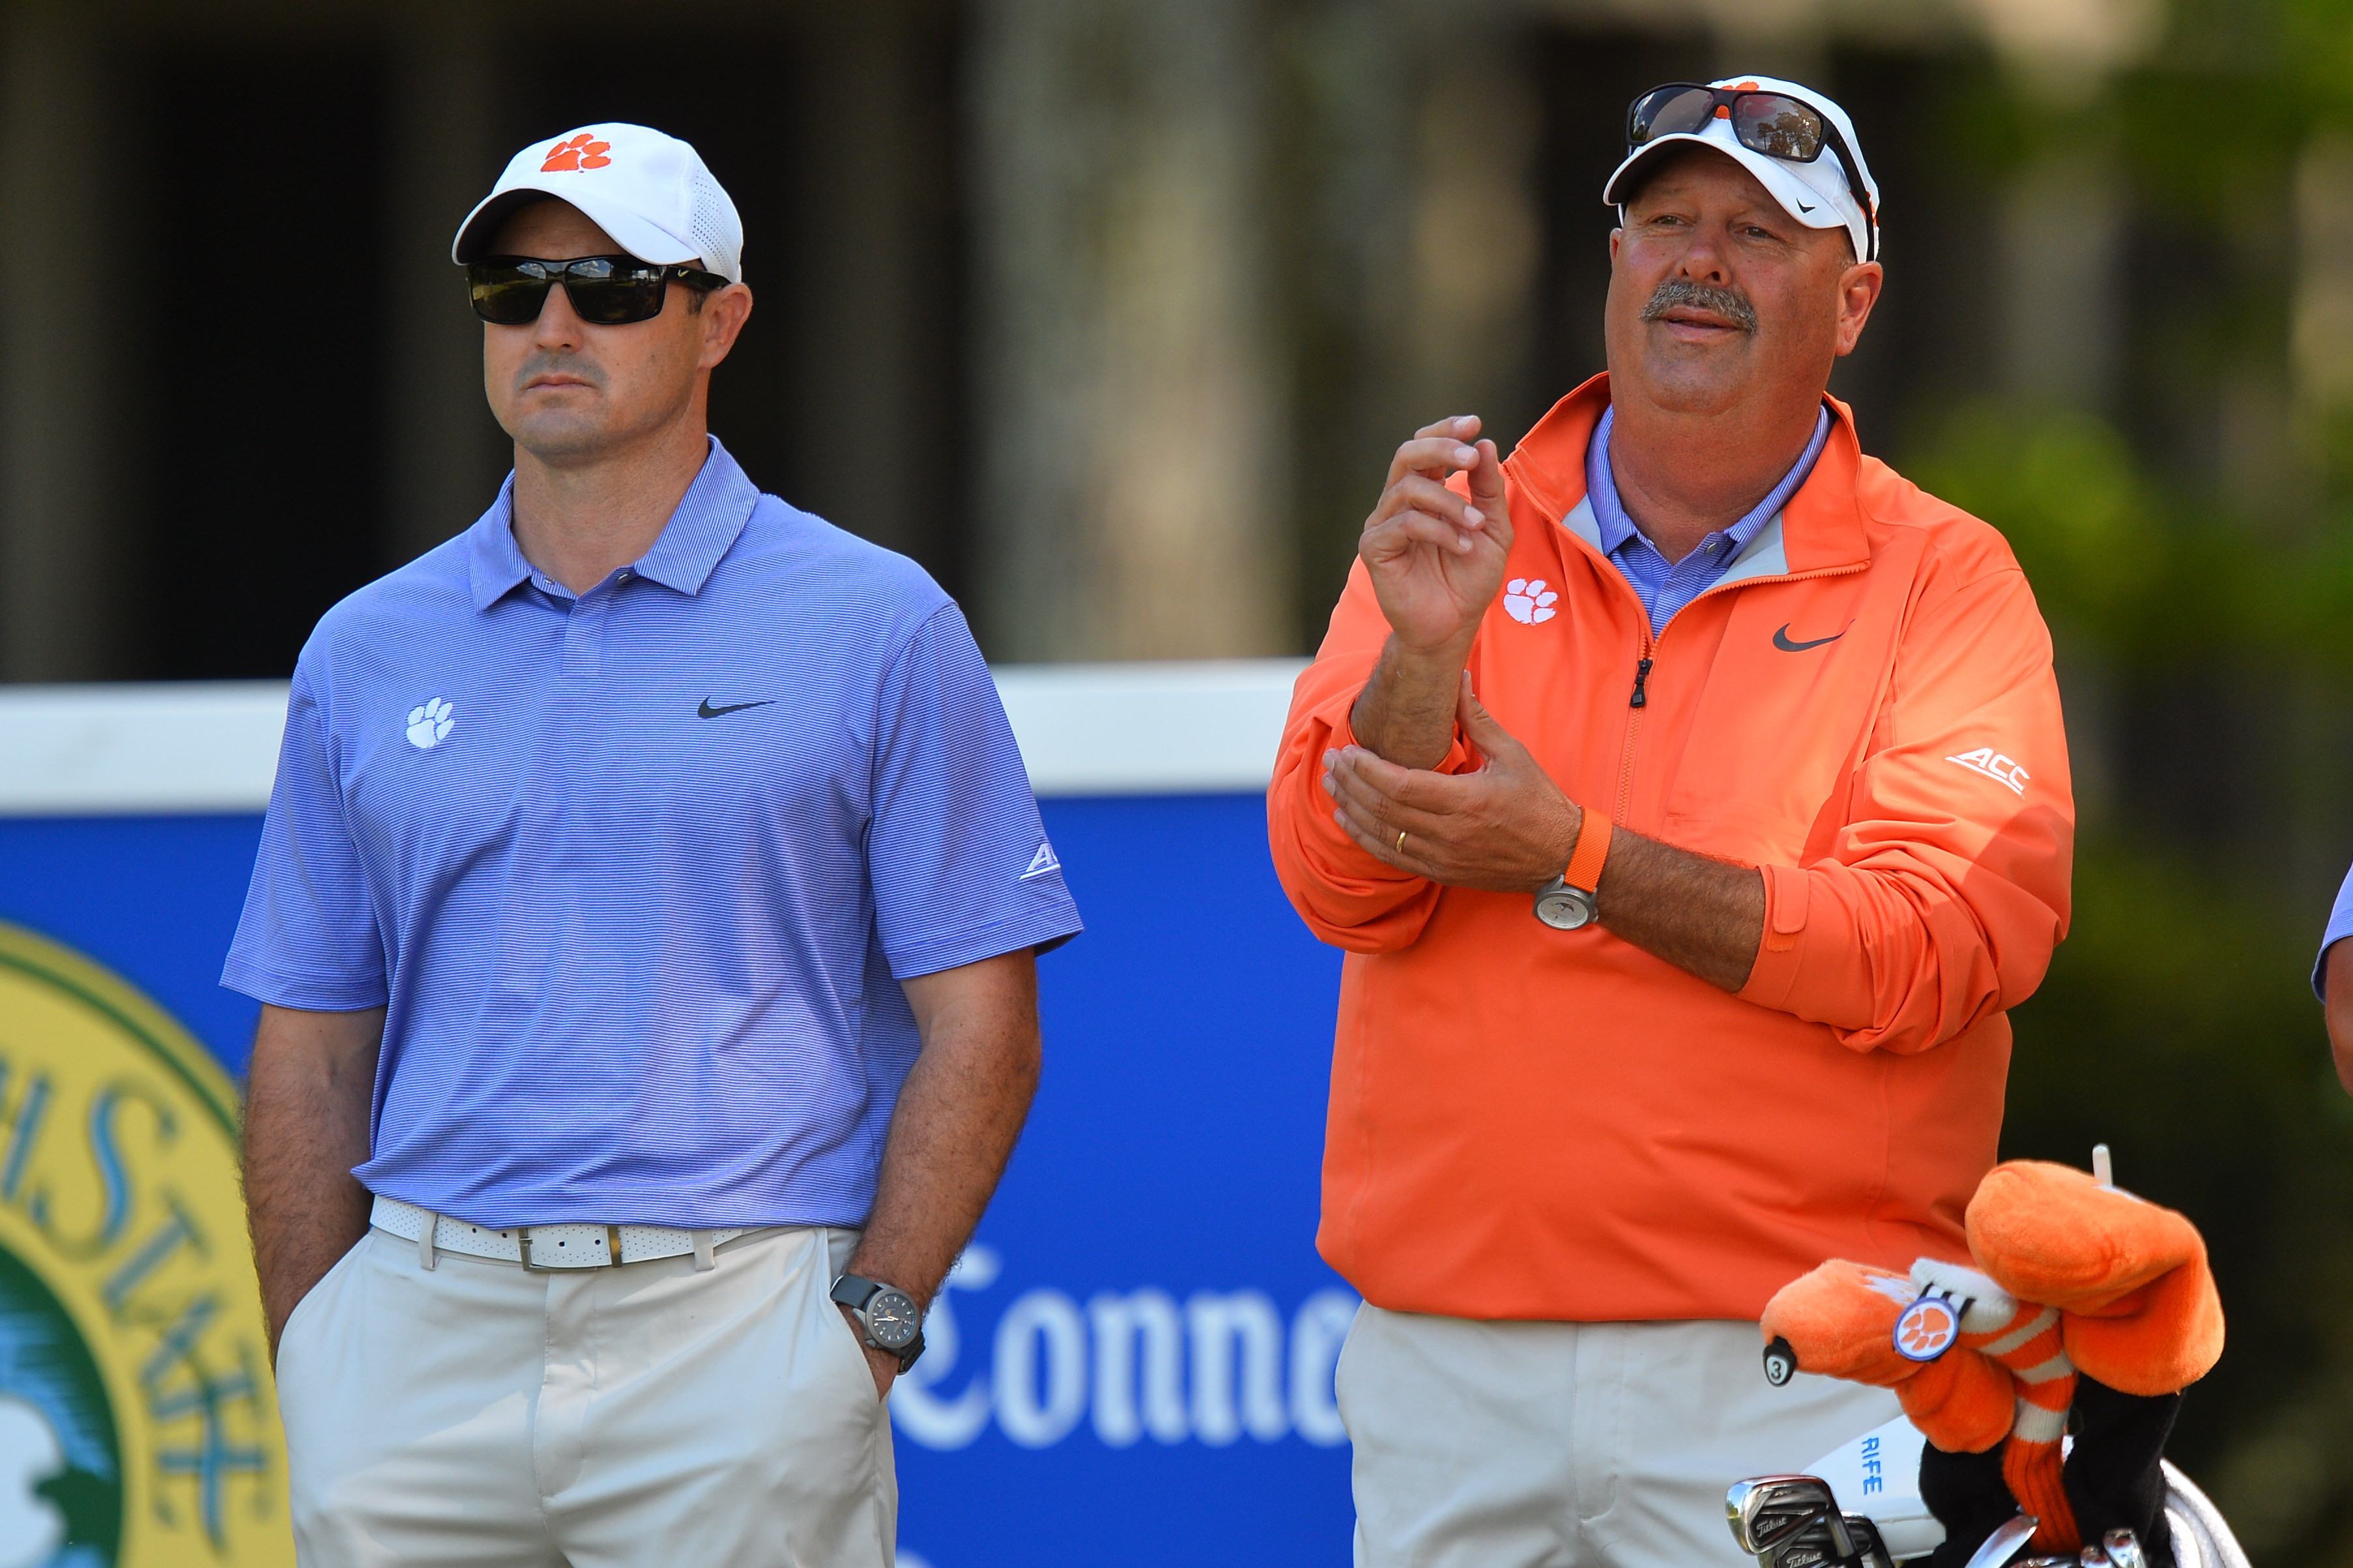 Kappa Alpha Makes Donation to Golf